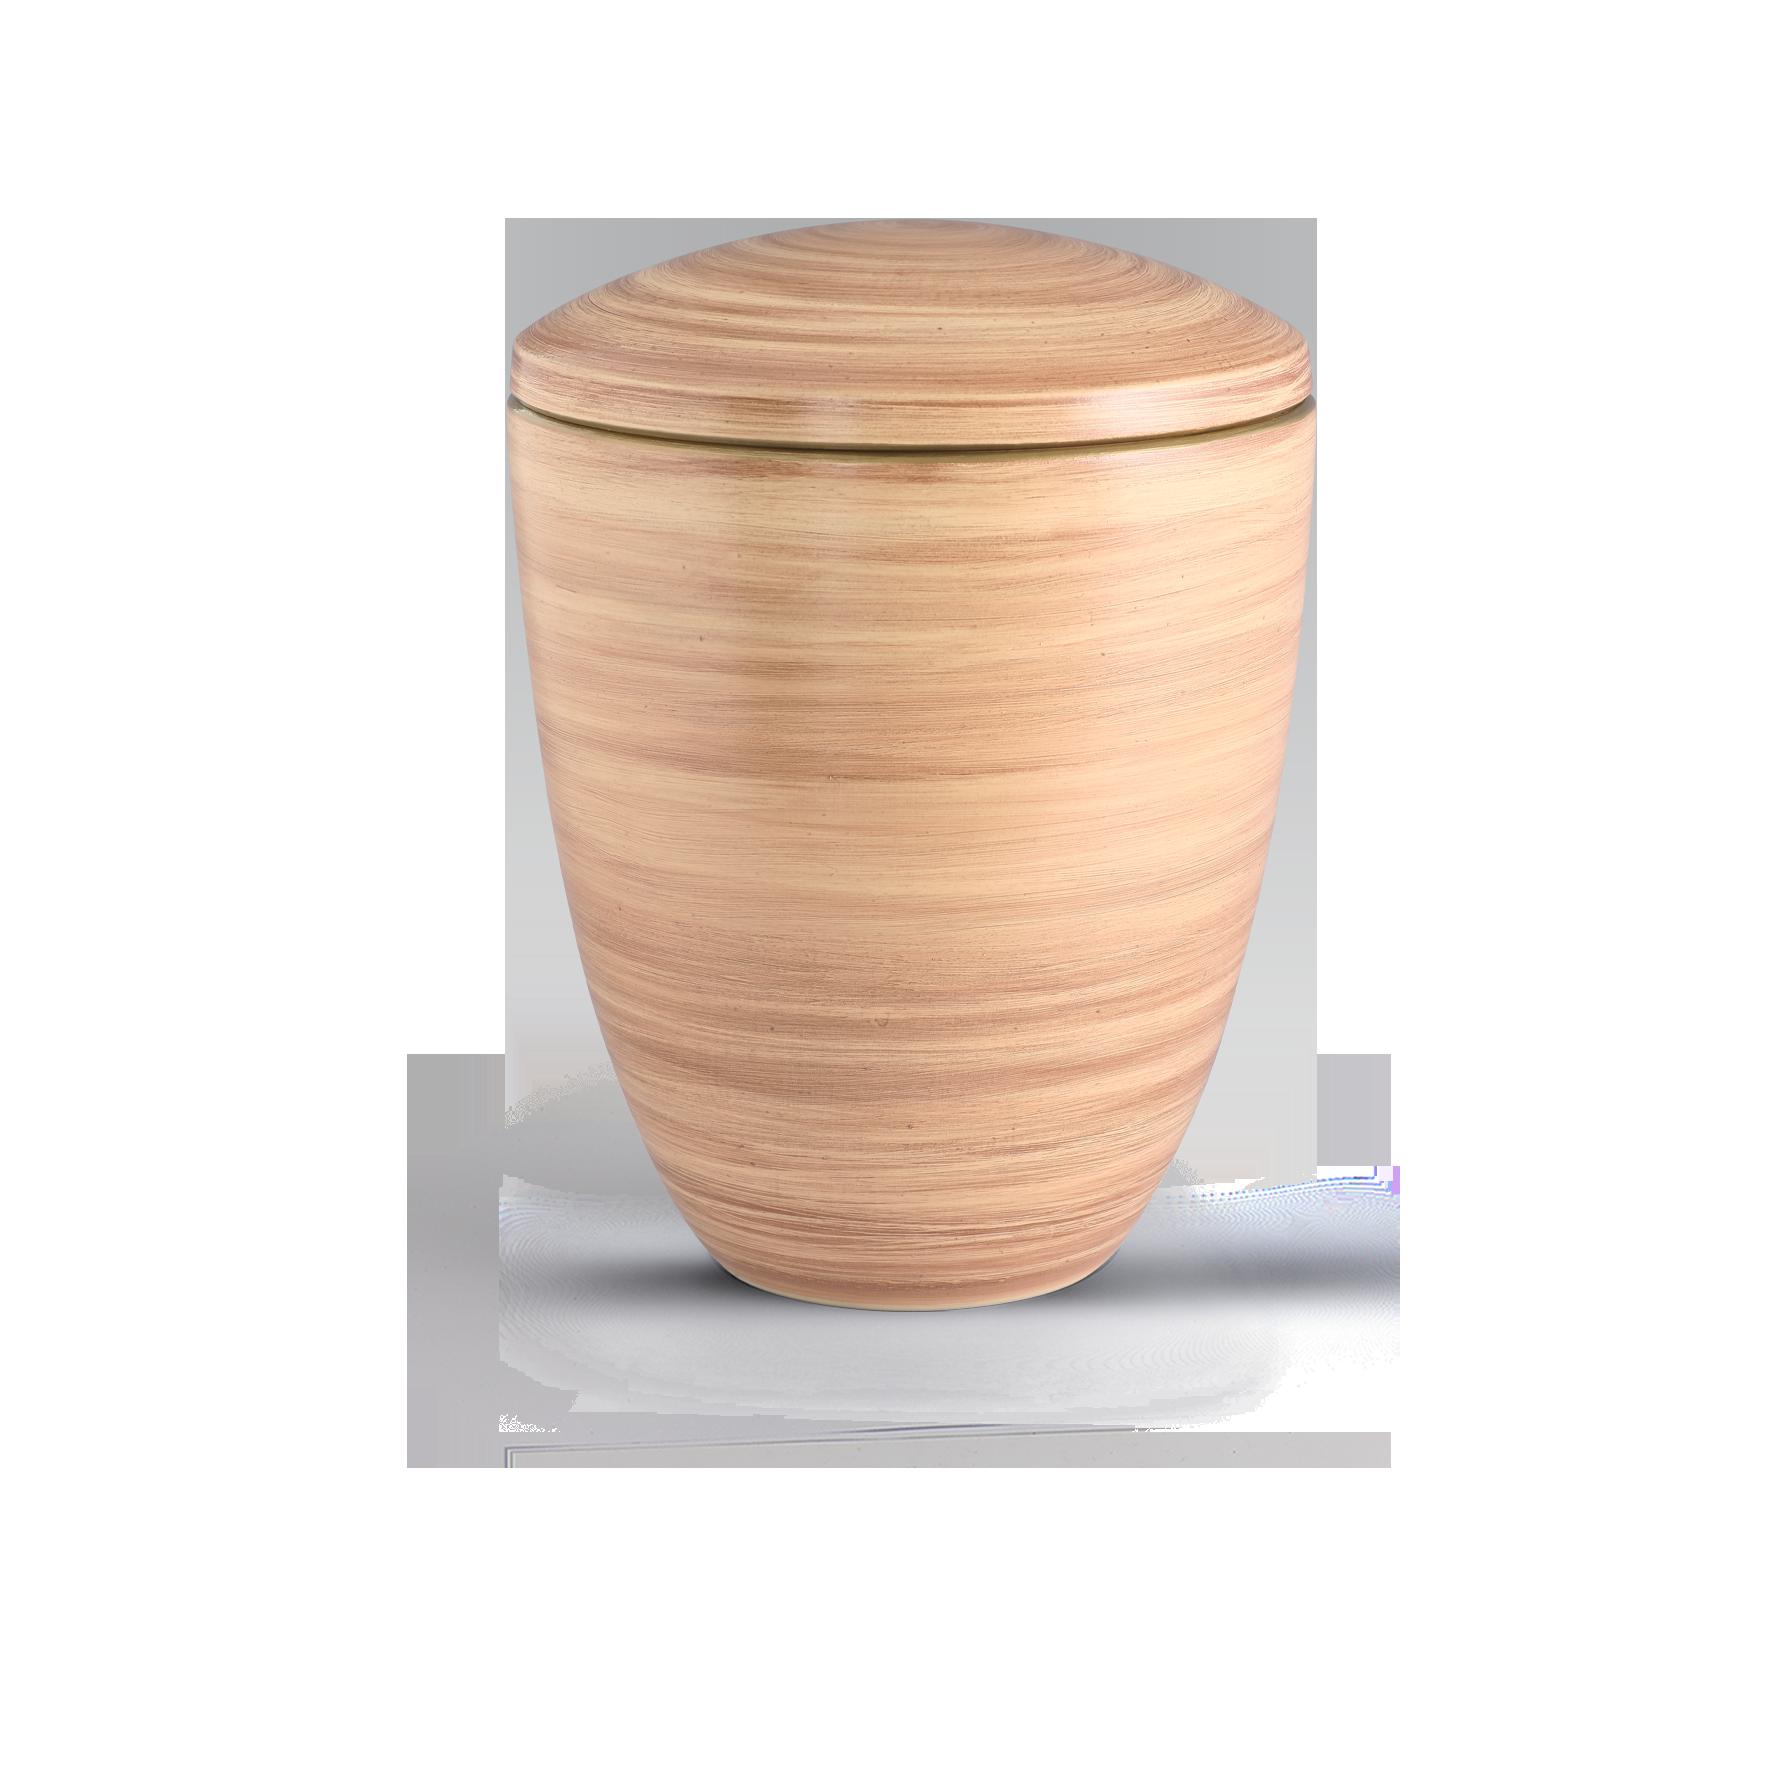 Edition Tosca Ceramica